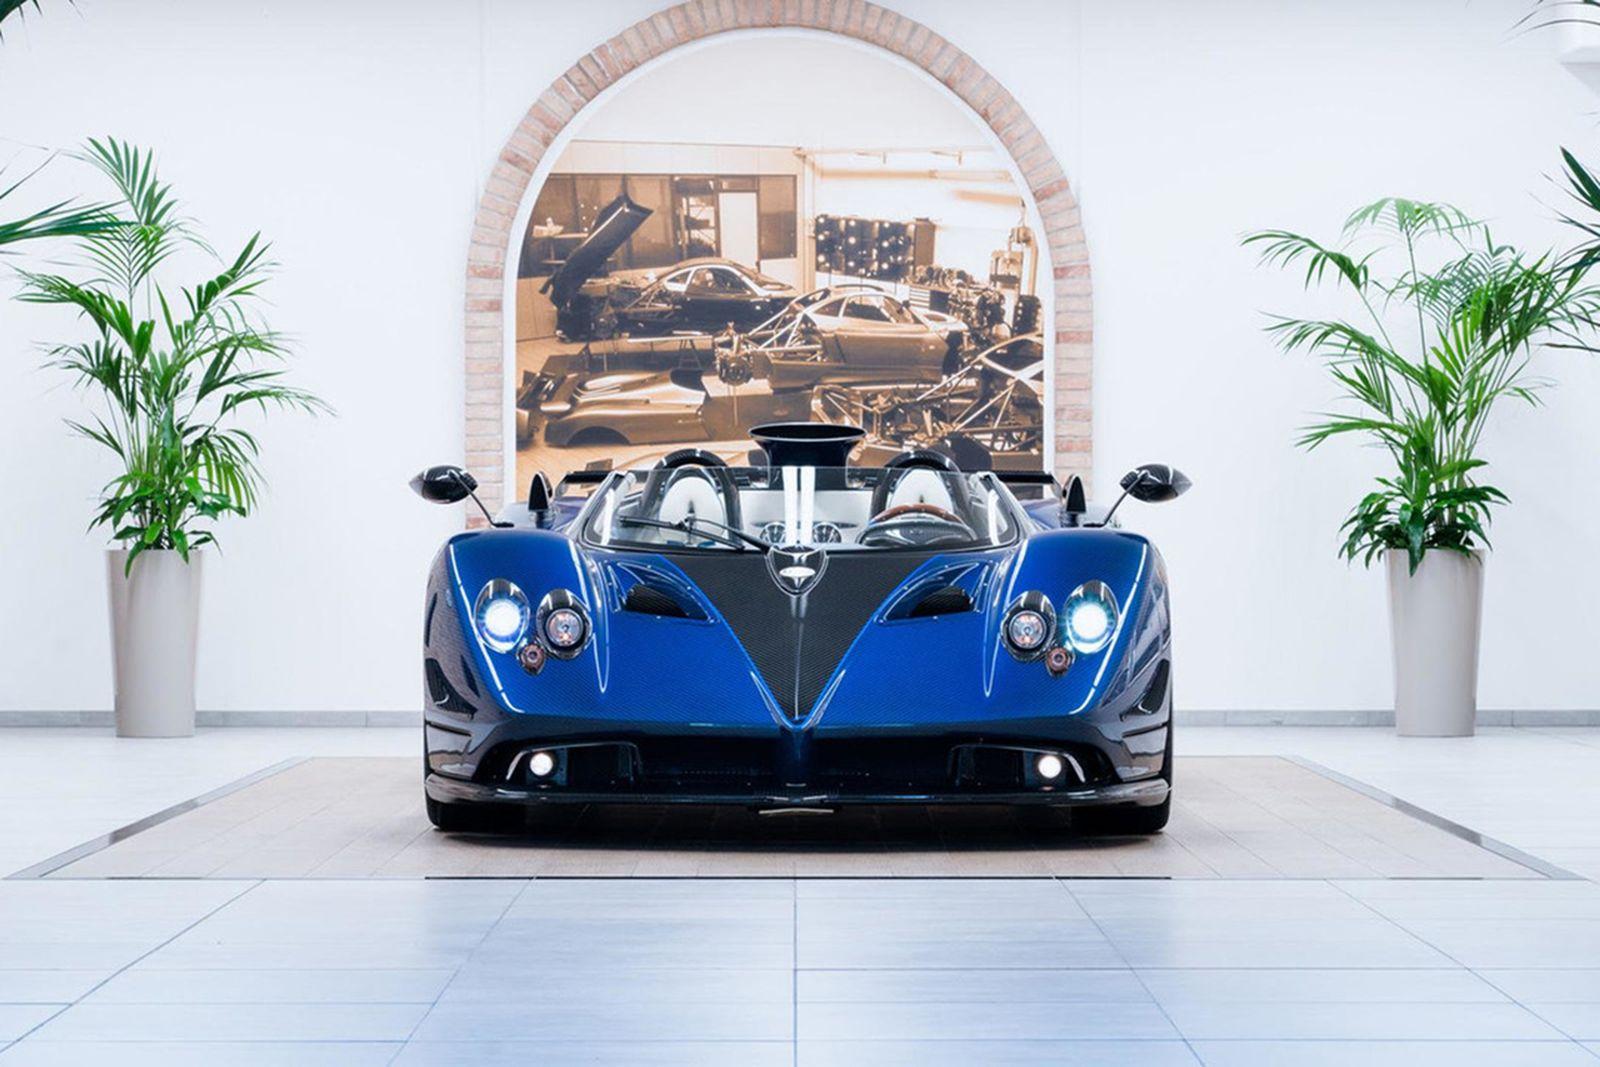 Pagani S 17 5 Million Zonda Hp Barchetta Is The Most Expensive Car In The World